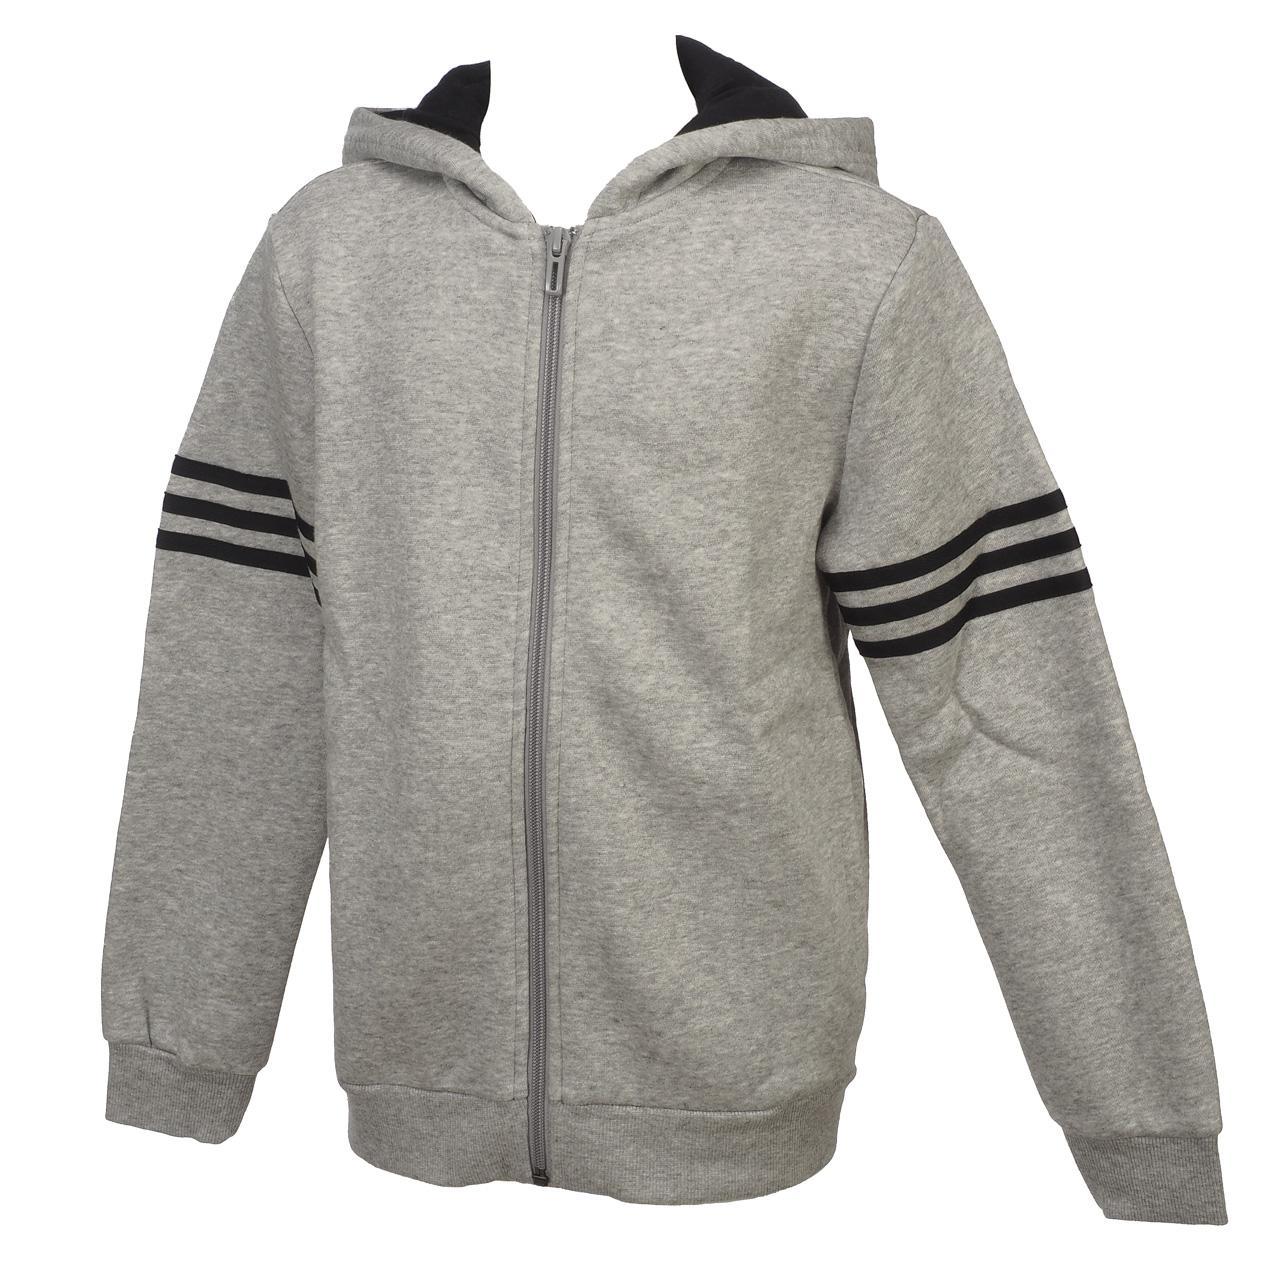 Jacken-Sweatshirts-Zipped-Kapuze-Adidas-Yb-Sid-Grc-Fz-Capsweat-Jr-Grau-46495